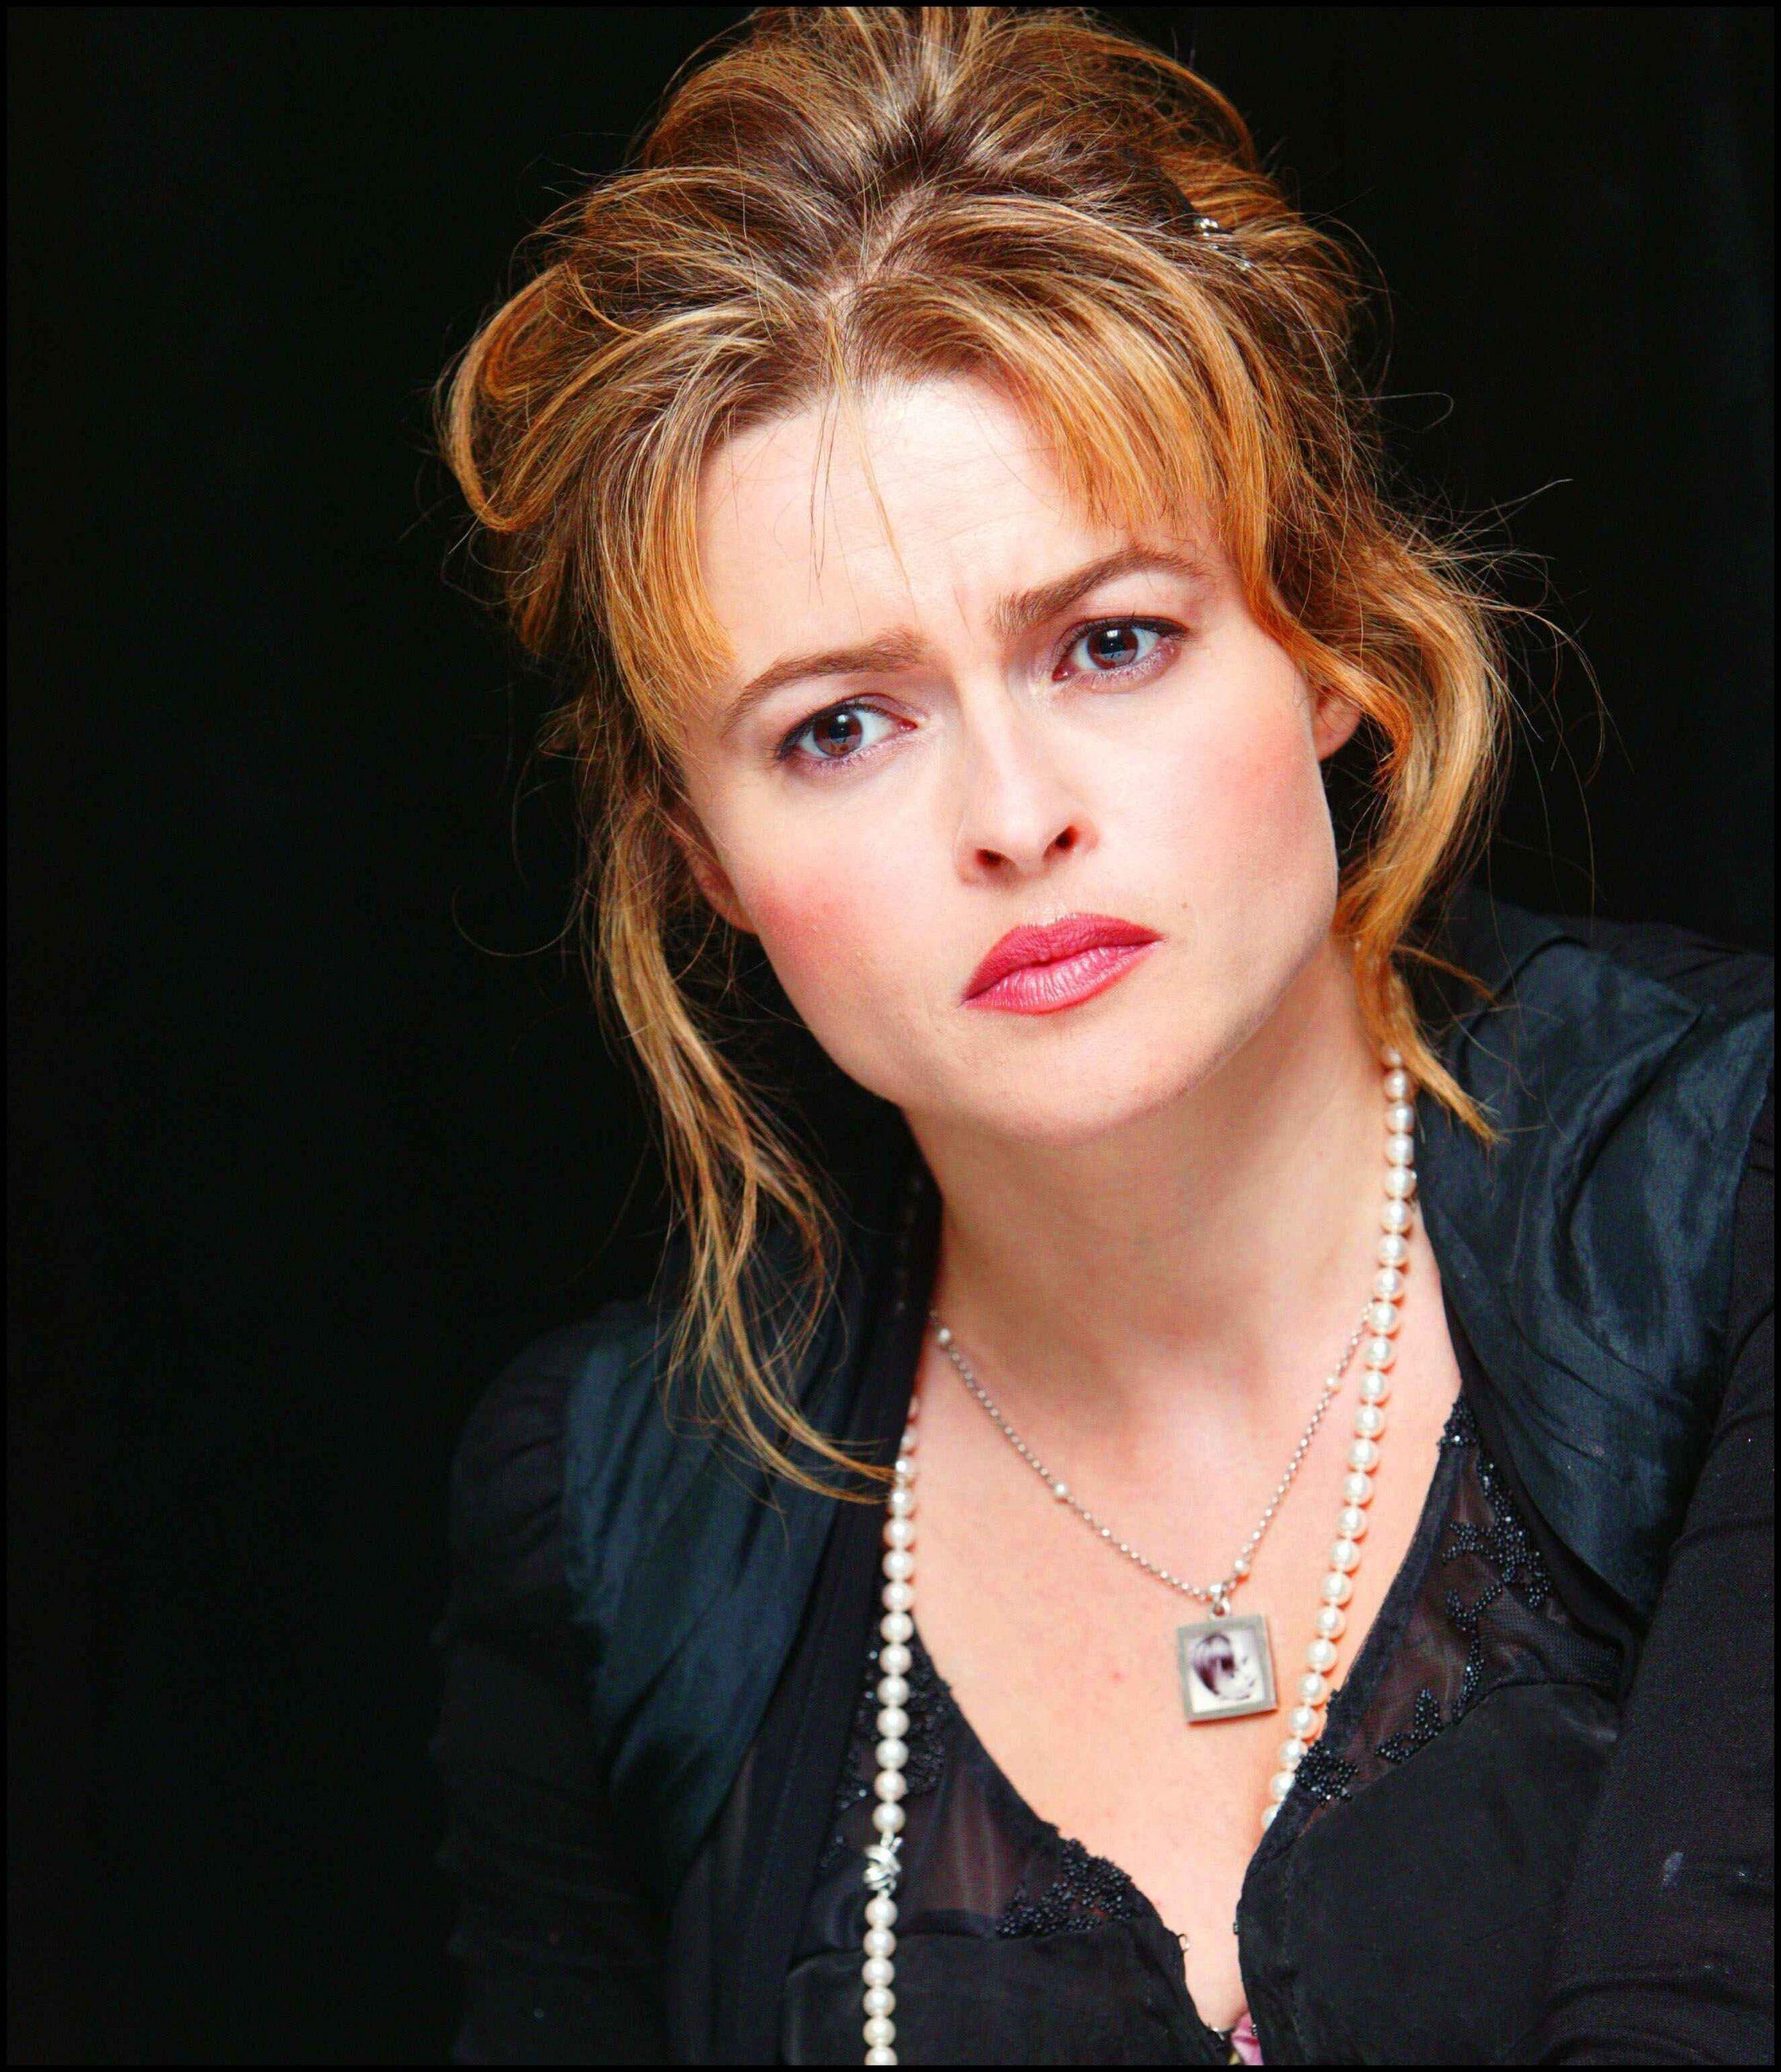 Images of Helena Bonham Carter | 2201x2560